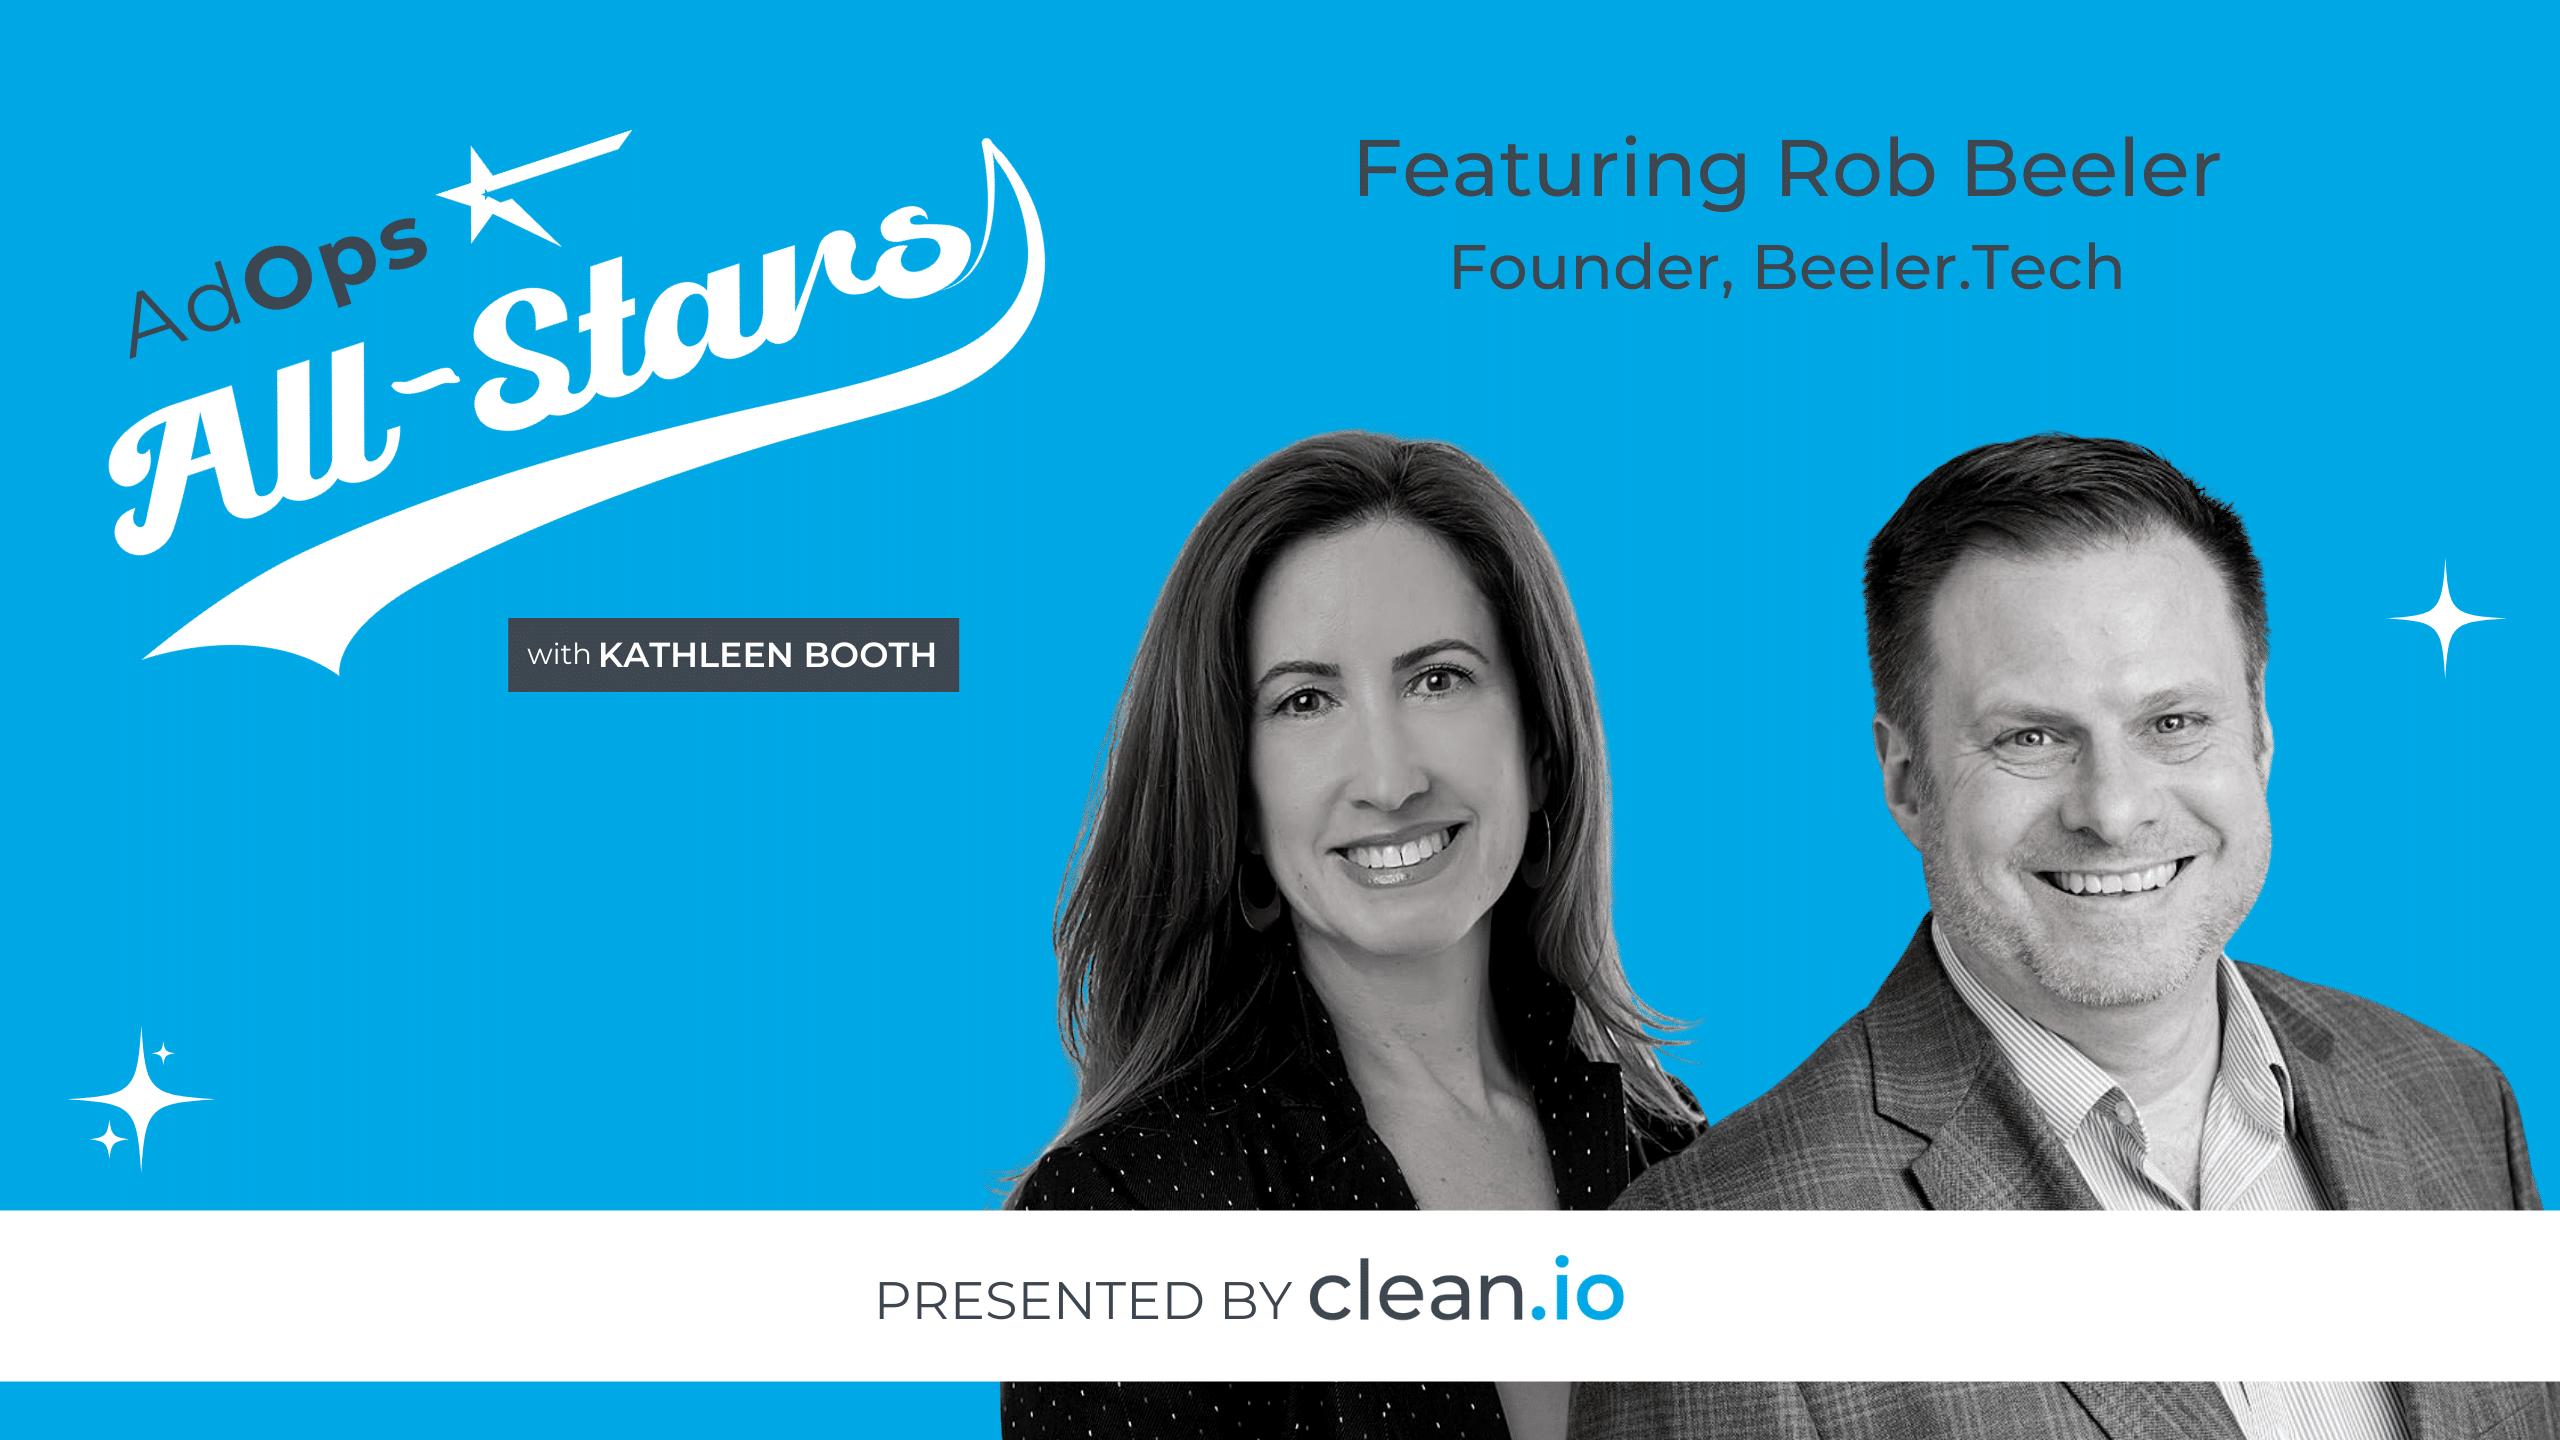 Ad Ops All Stars: Rob Beeler, Beeler.Tech